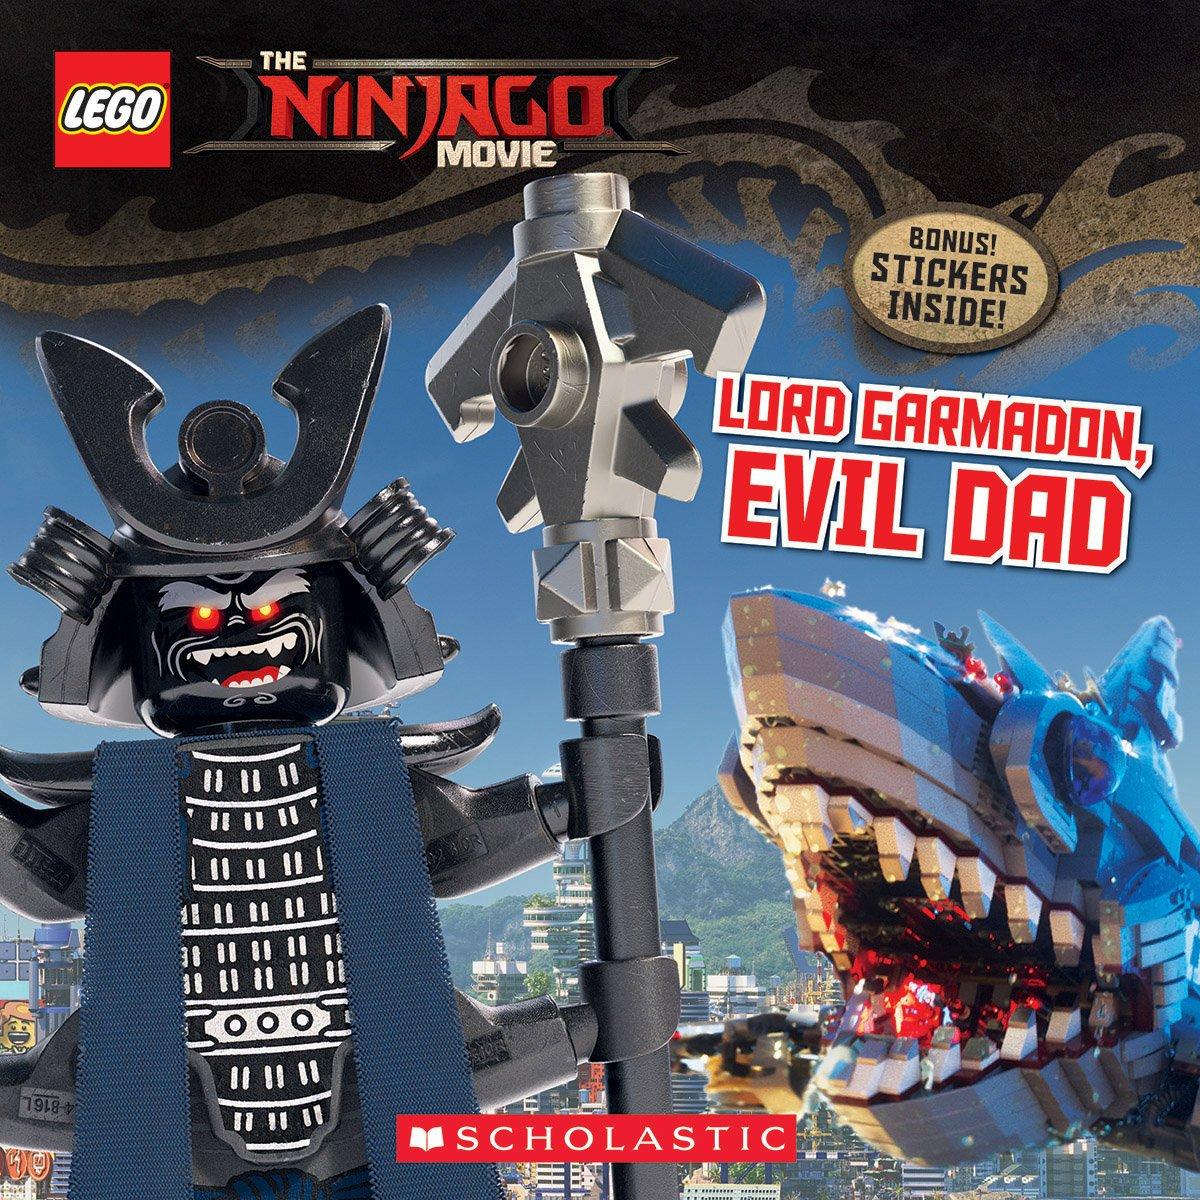 Lord Garmadon, Evil Dad (The LEGO NINJAGO MOVIE: Storybook